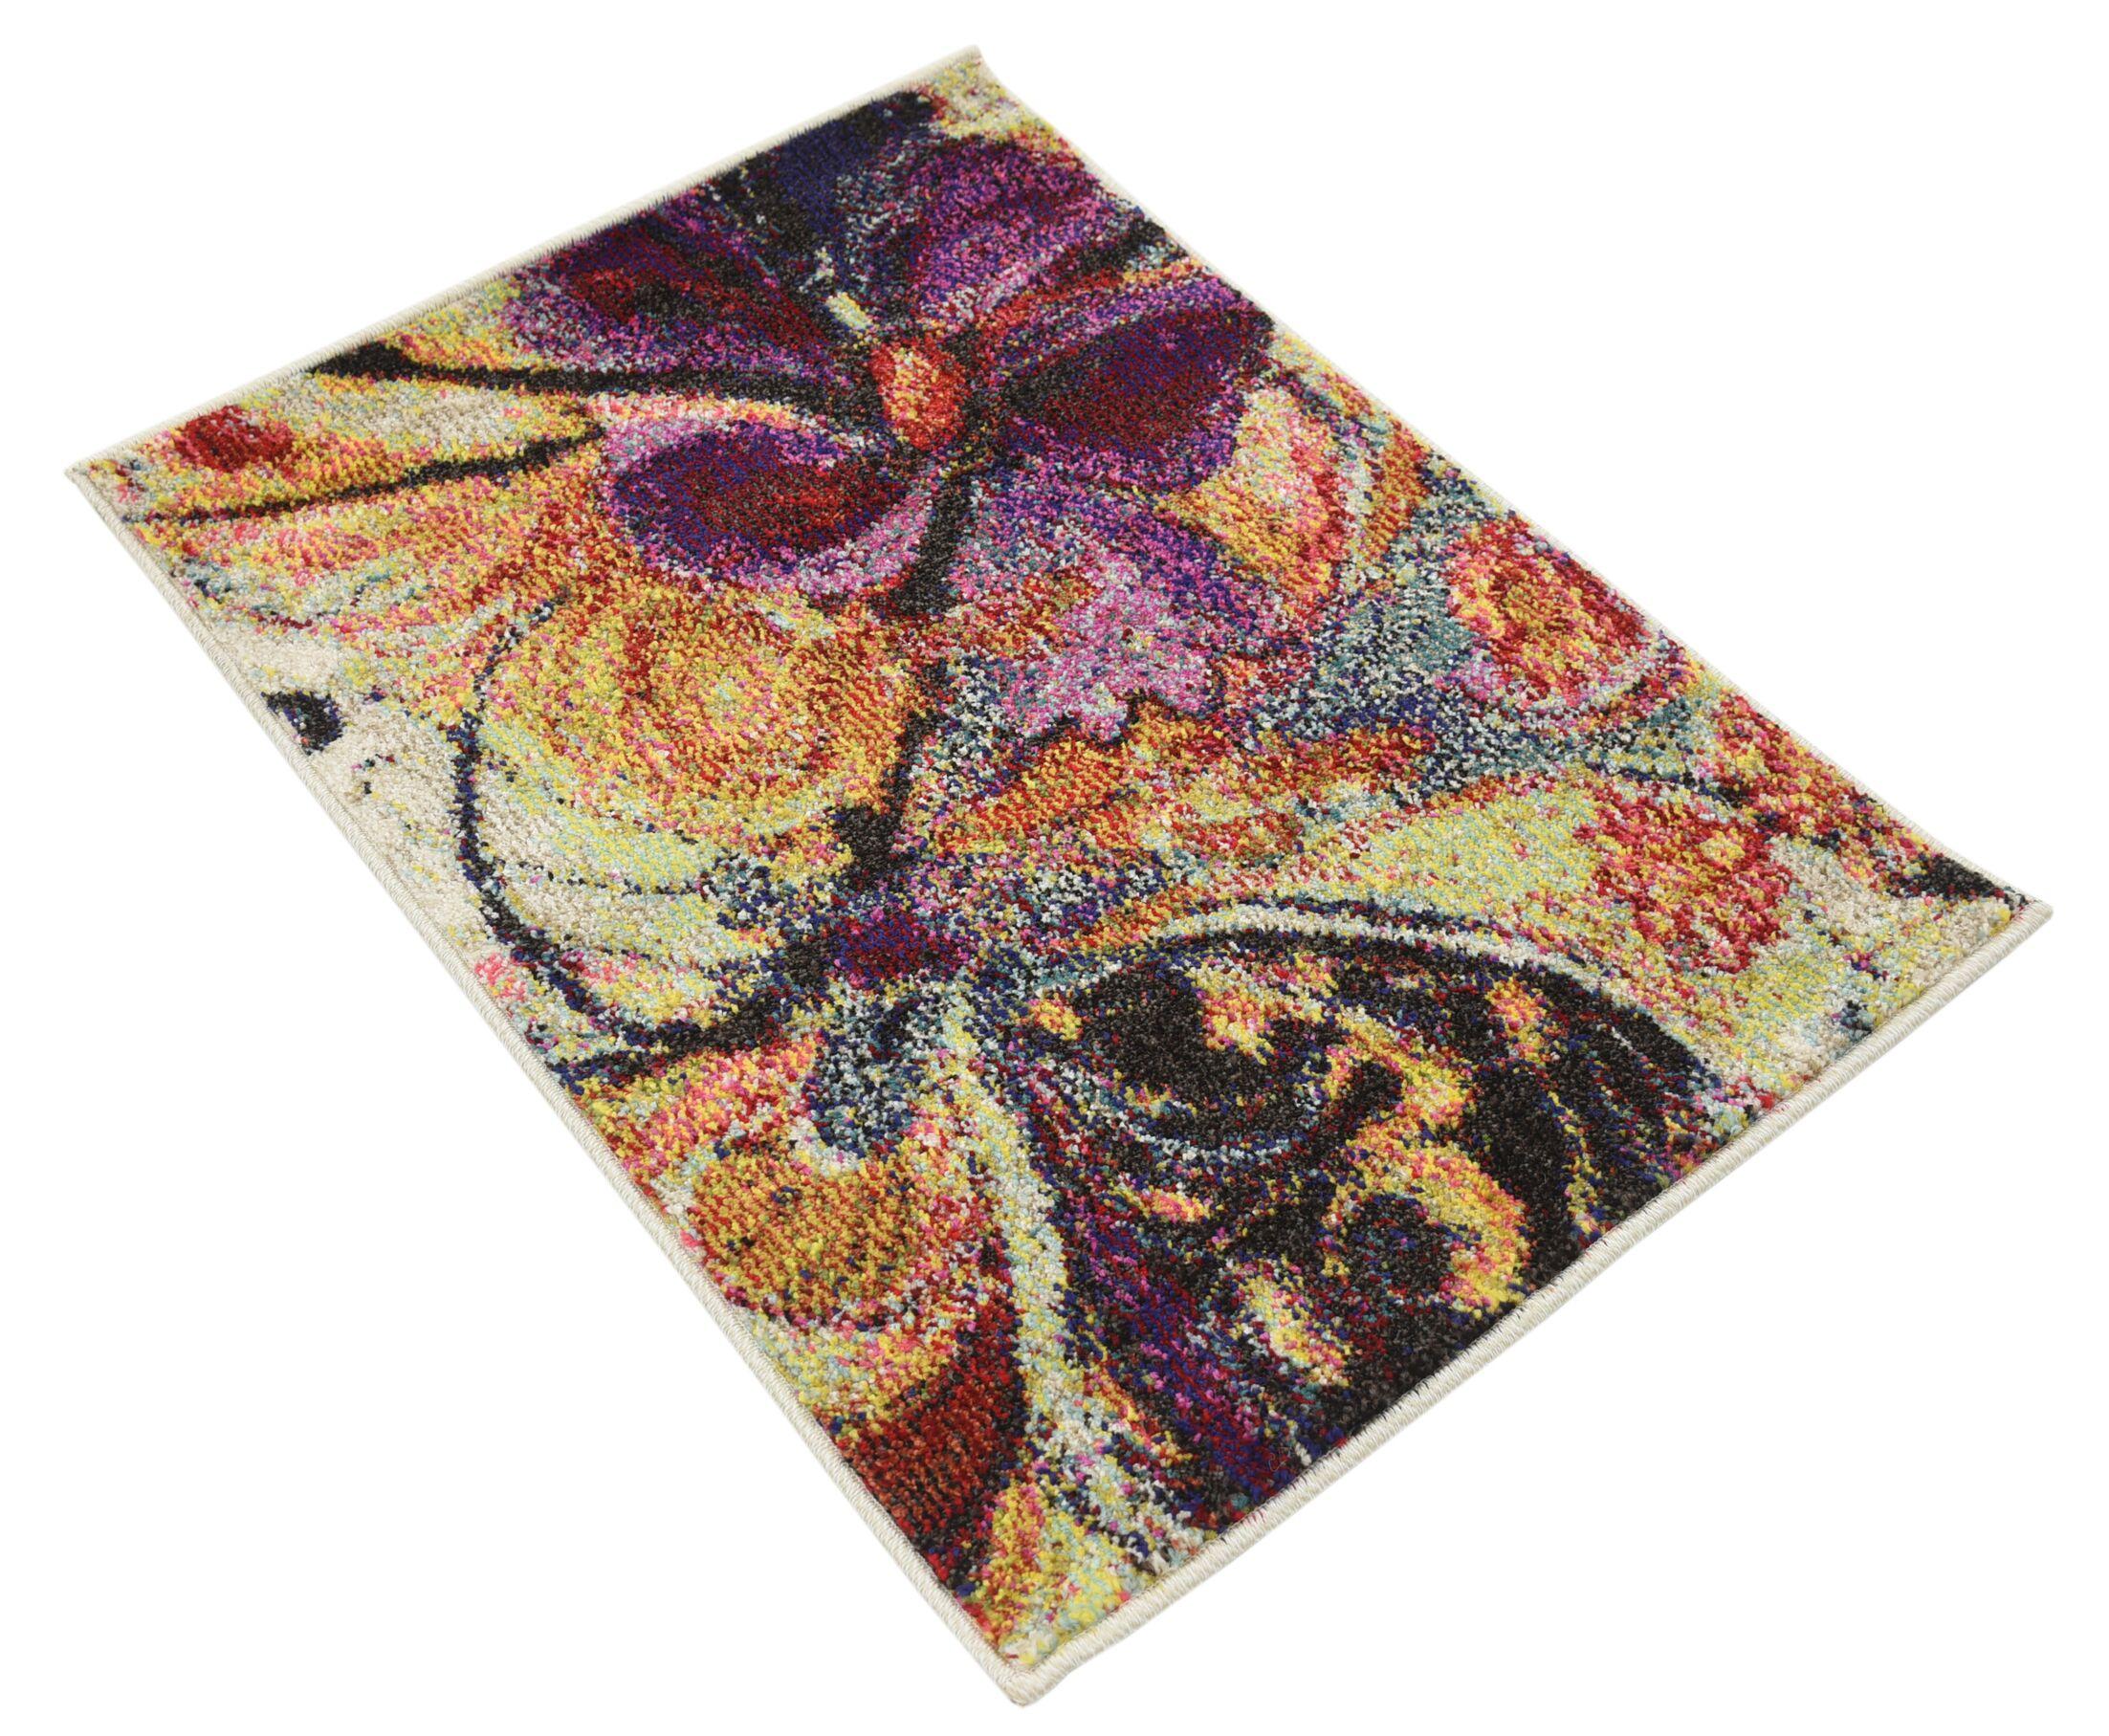 Sofia Beige/Purple Area Rug Rug Size: Rectangle 6' x 9'